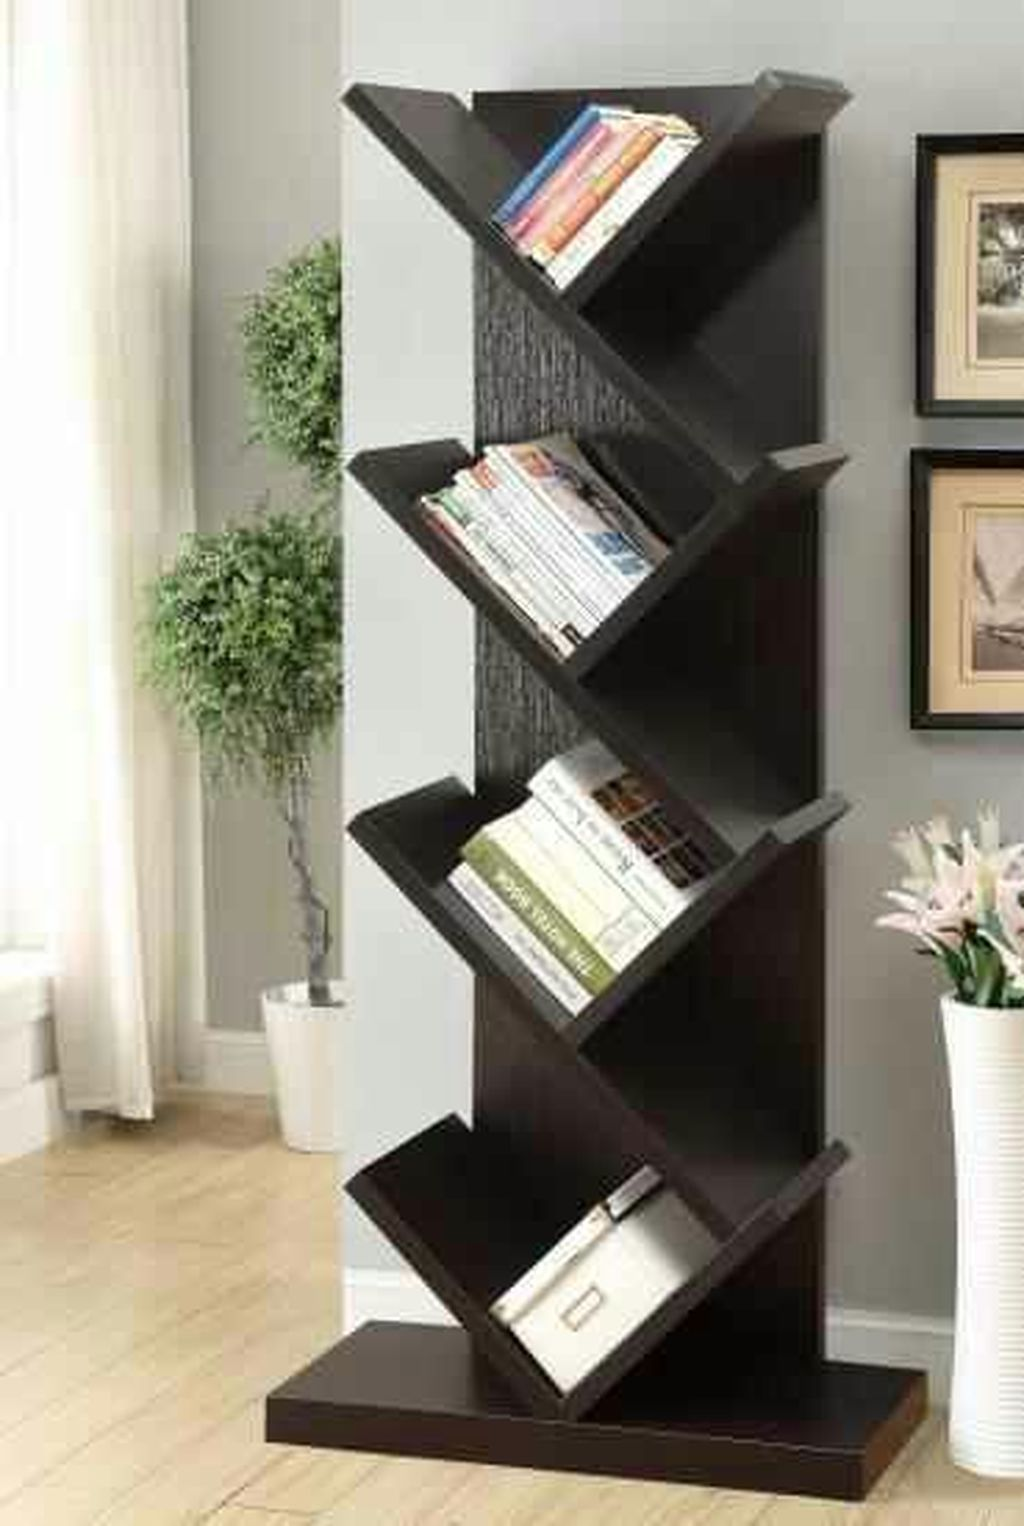 37 Creative Bookshelf Design Ideas To Copy Asap In 2020 Furniture Bookshelves Creative Bookshelves Furniture Design Table